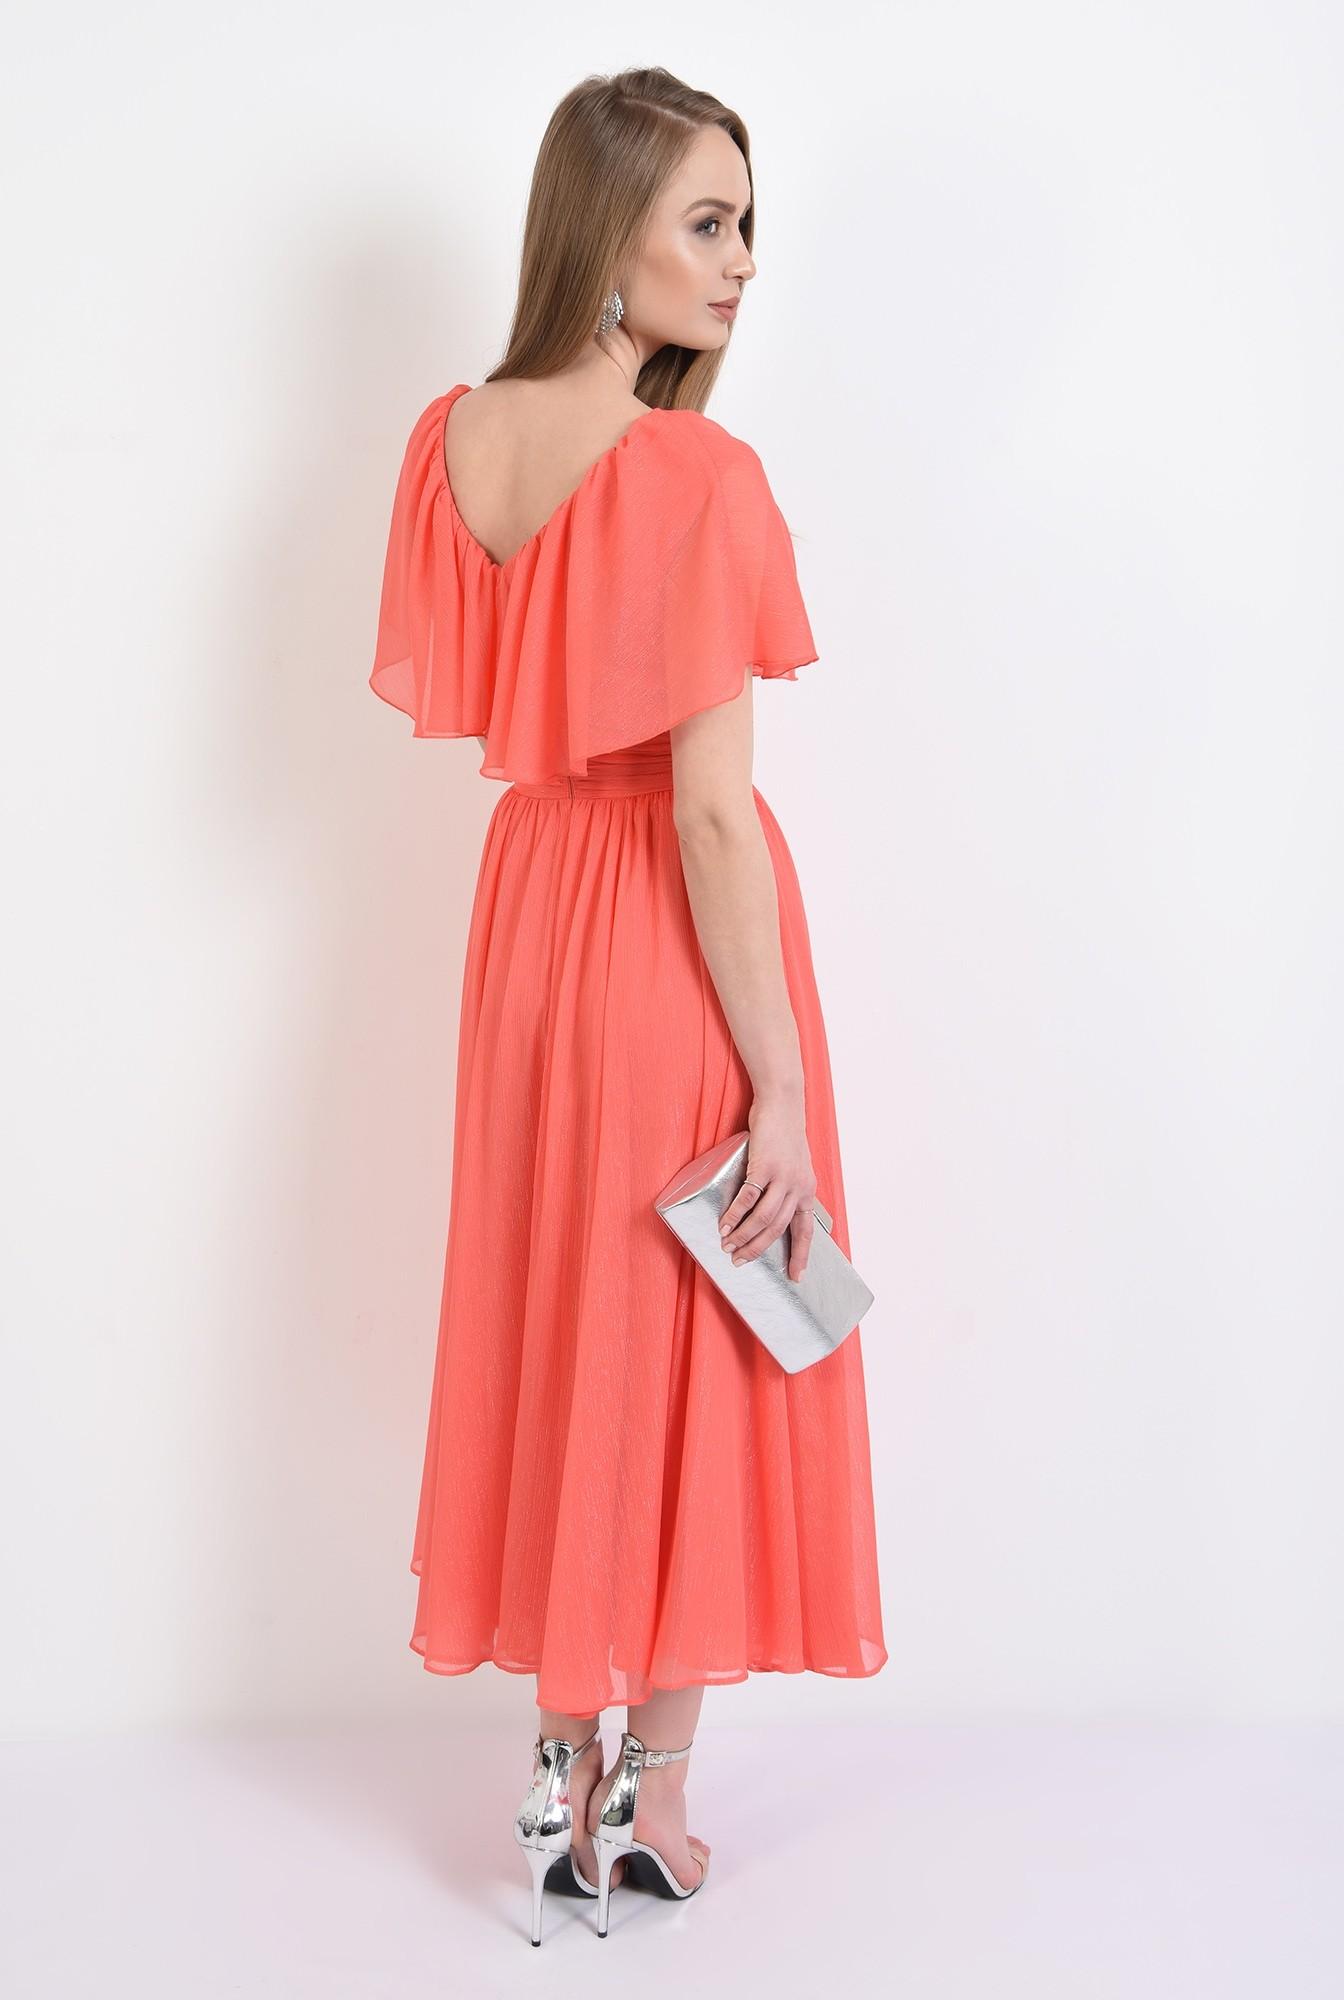 1 - rochie eleganta, midi, volan, brau fronsat, evazata, rochie de seara